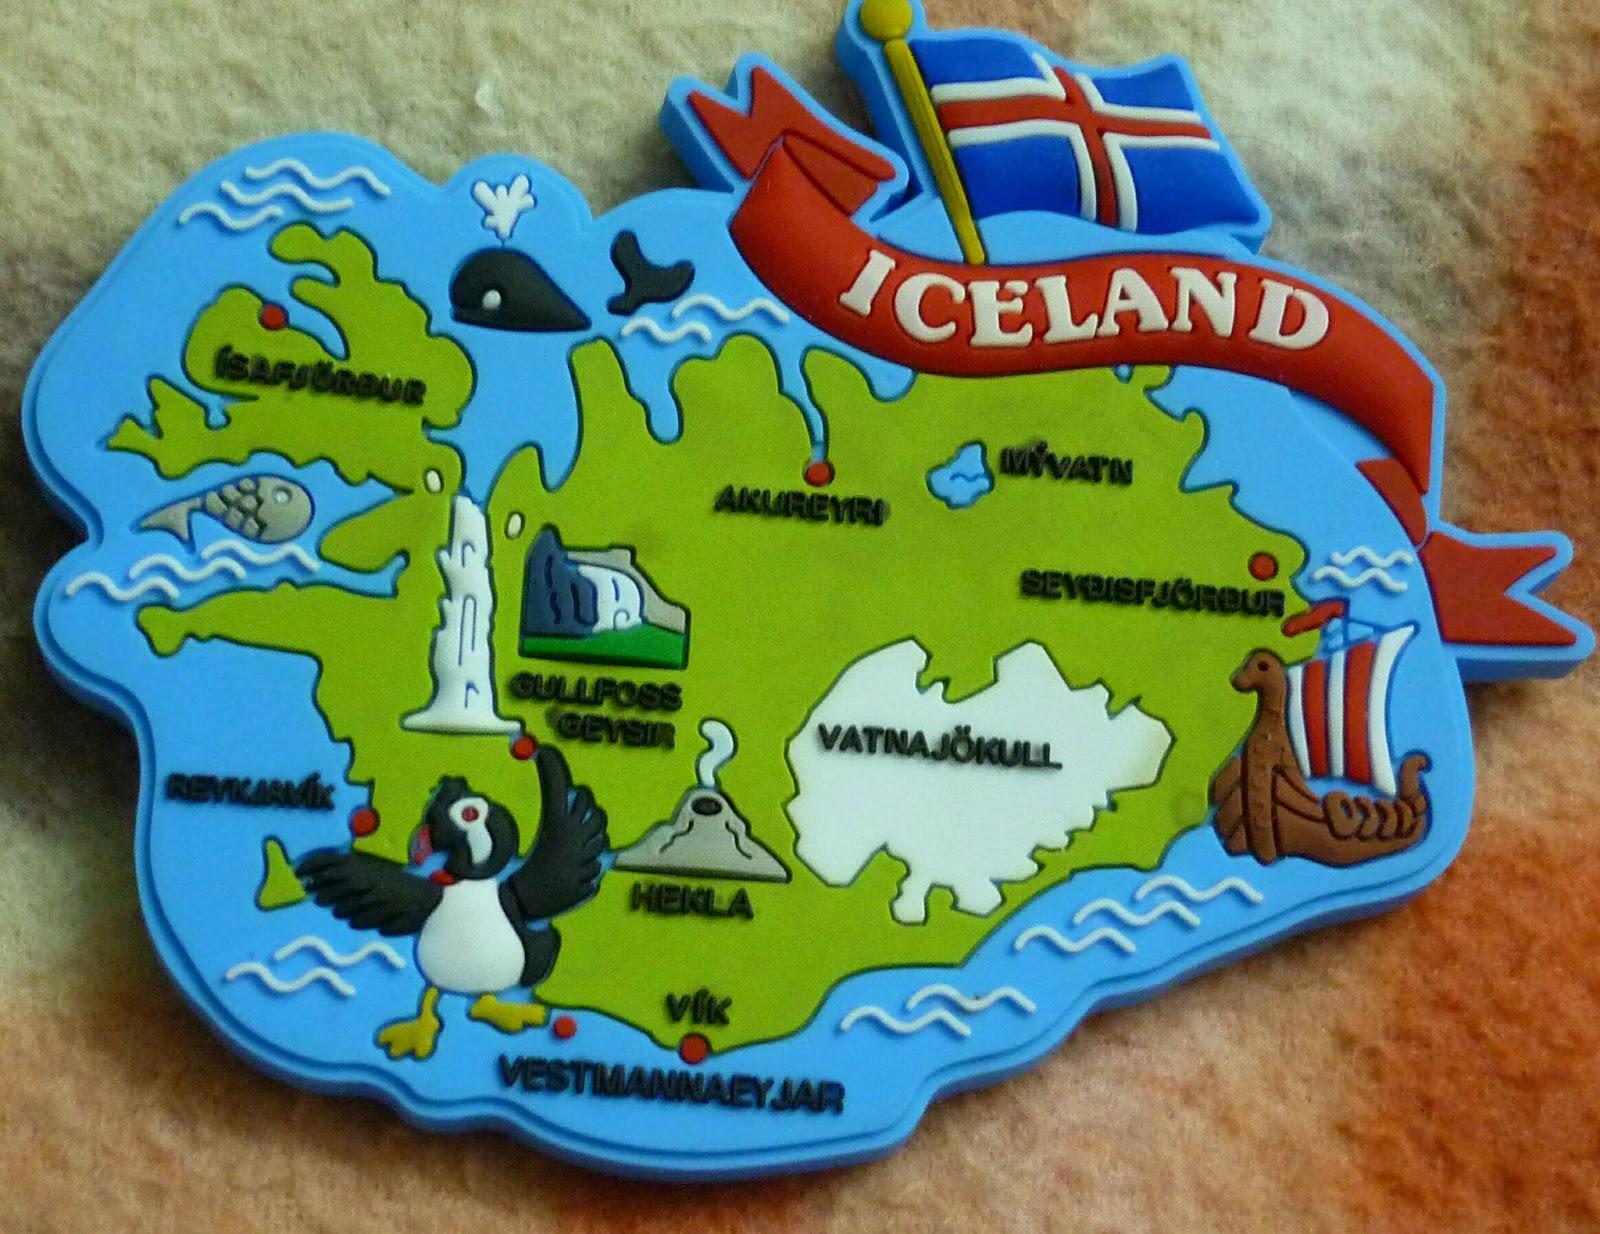 Our fridge magnet has Vatnajokull too!